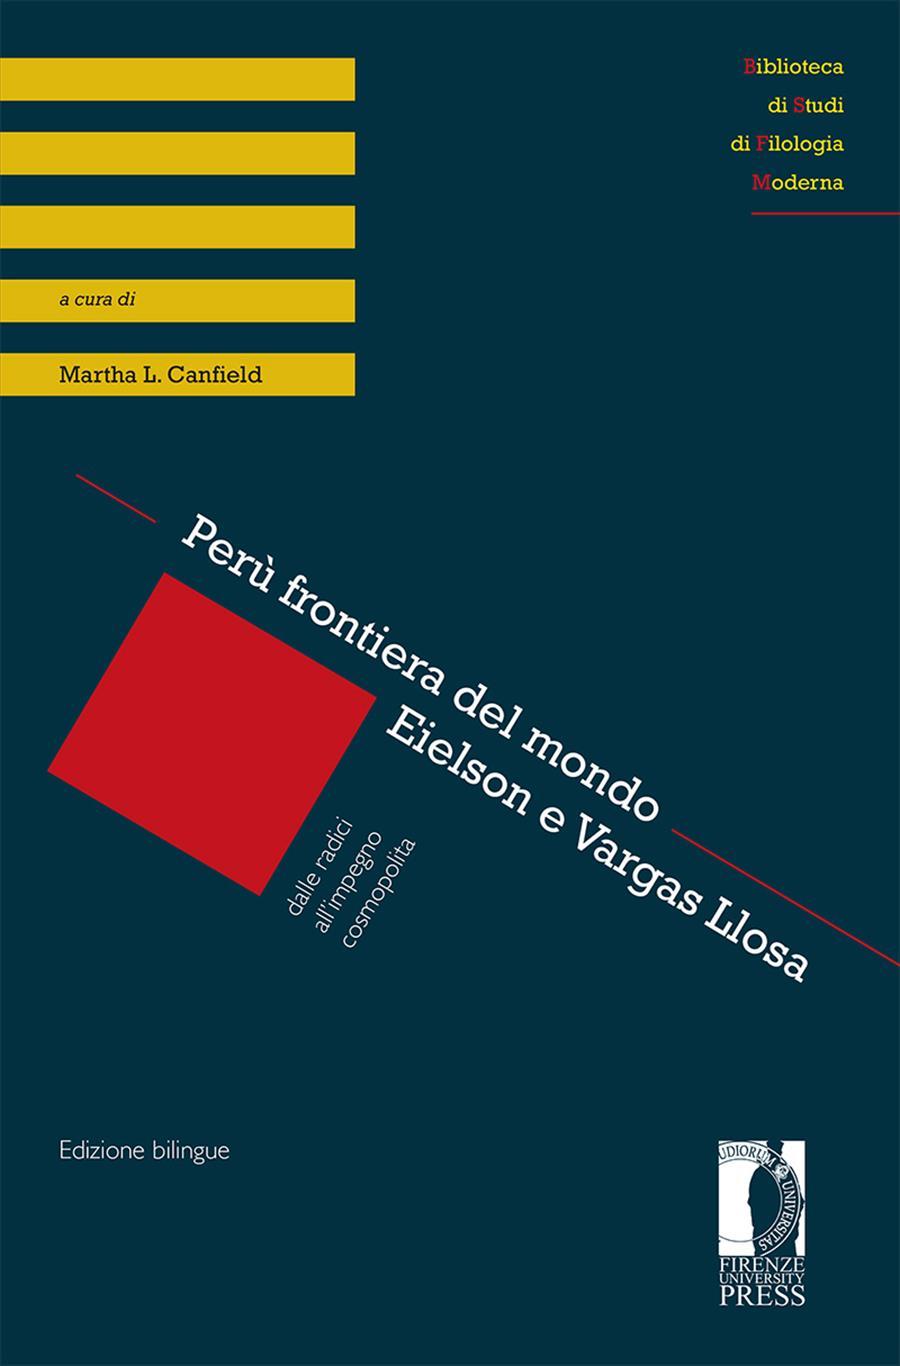 Perù frontiera del mondo. Eielson e Vargas Llosa: dalle radici all'impegno cosmopolita / Perú frontera del mundo. Eielson y Vargas Llosa: de las raíces al compromiso cosmopolita